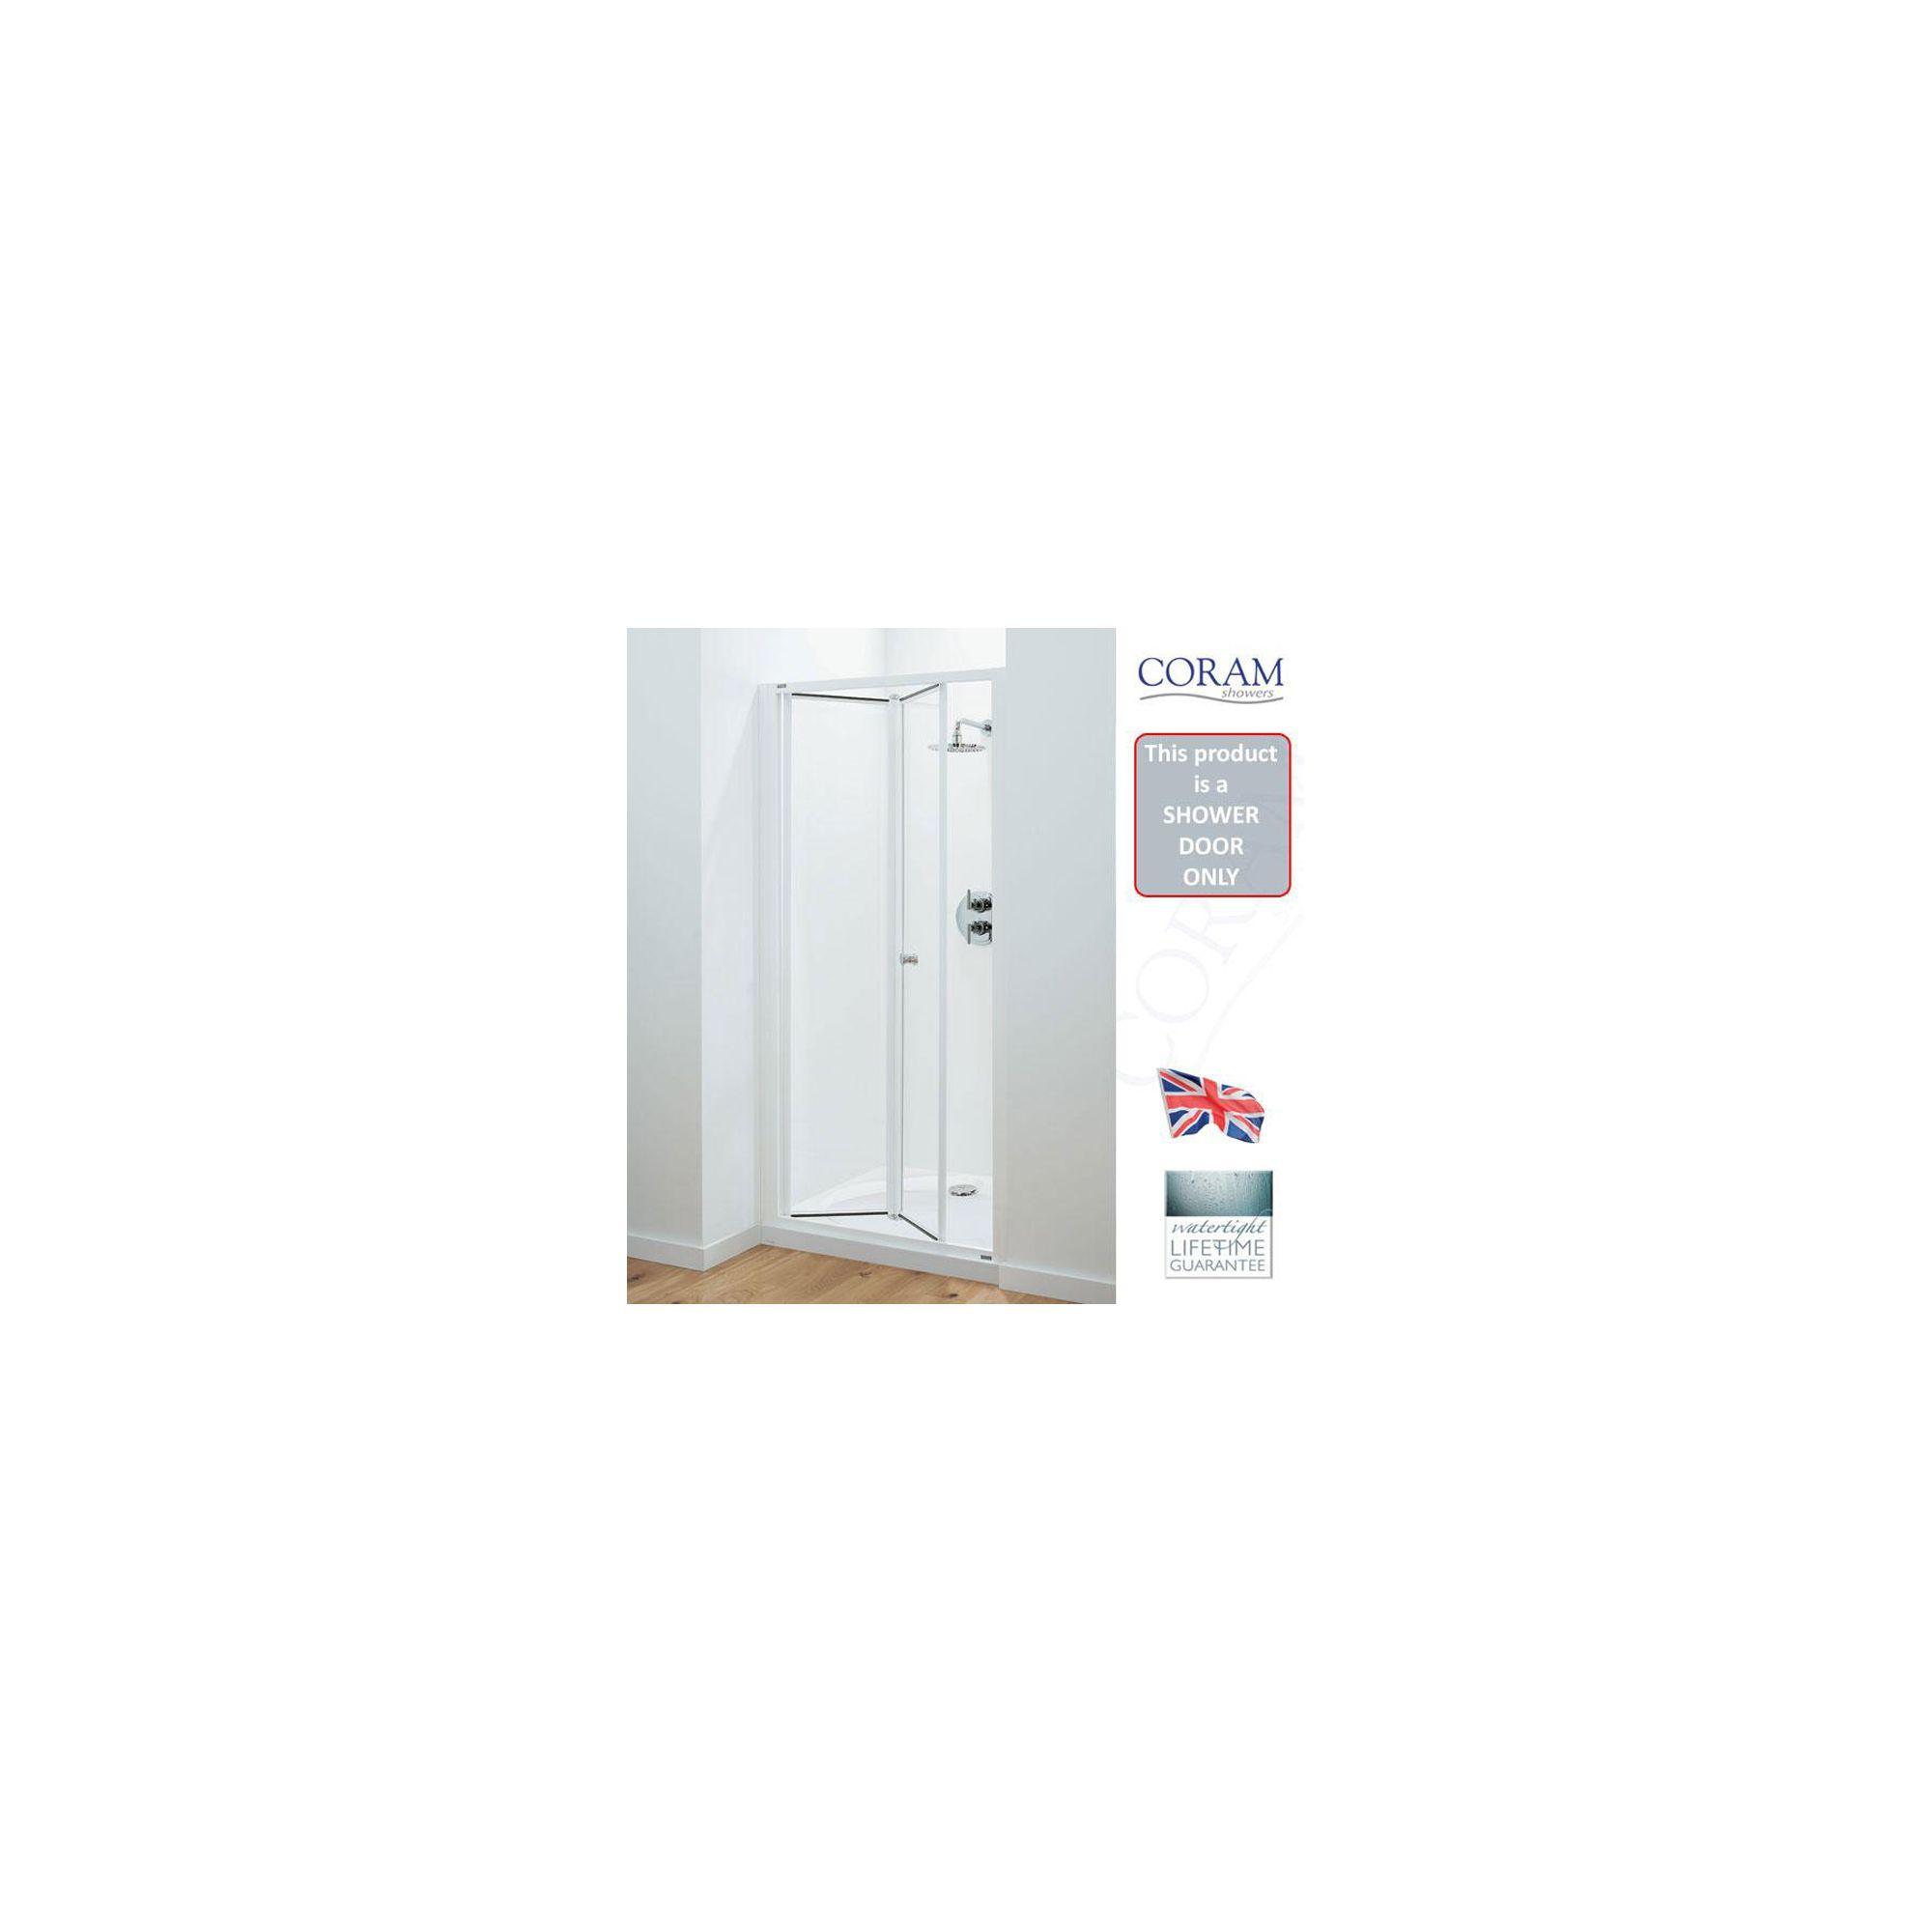 Coram Optima Bi-Fold Shower Door, 760mm Wide, Chrome Frame, 6mm Plain Glass at Tesco Direct